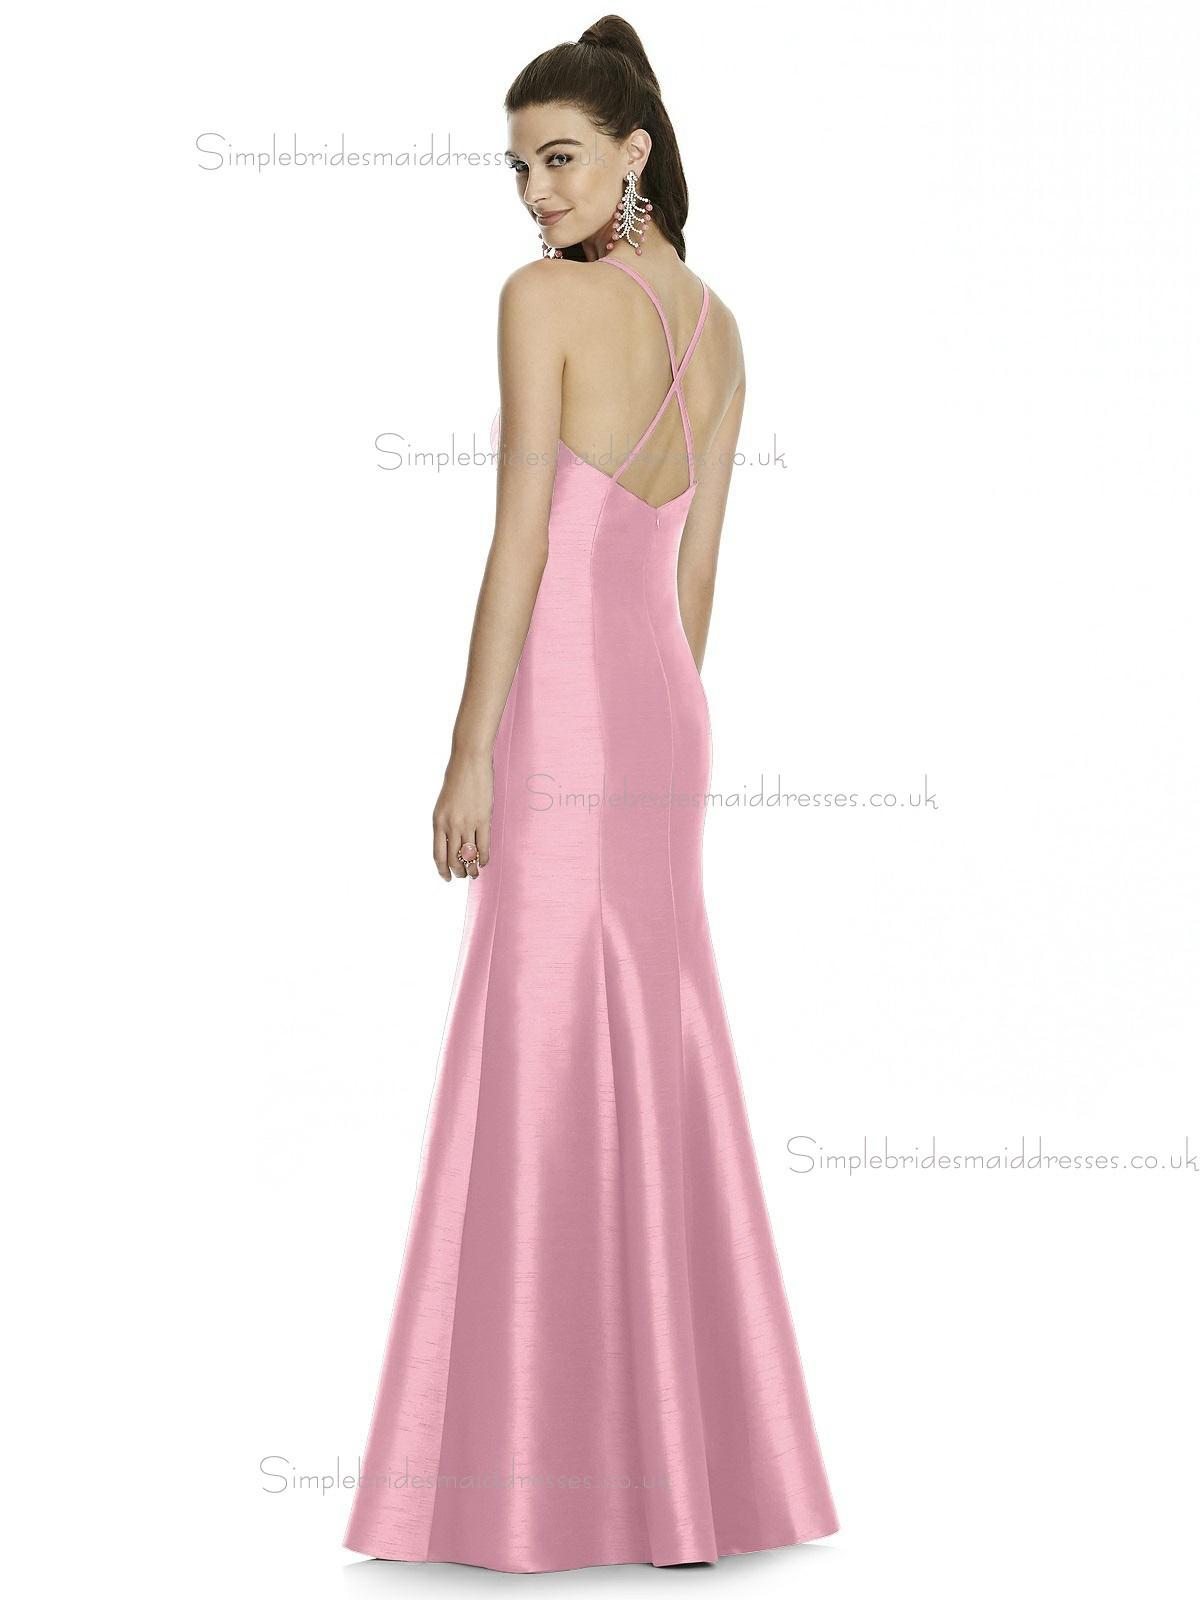 UK Beautiful Romantica Long Candy Pink Sleeveless Memaid